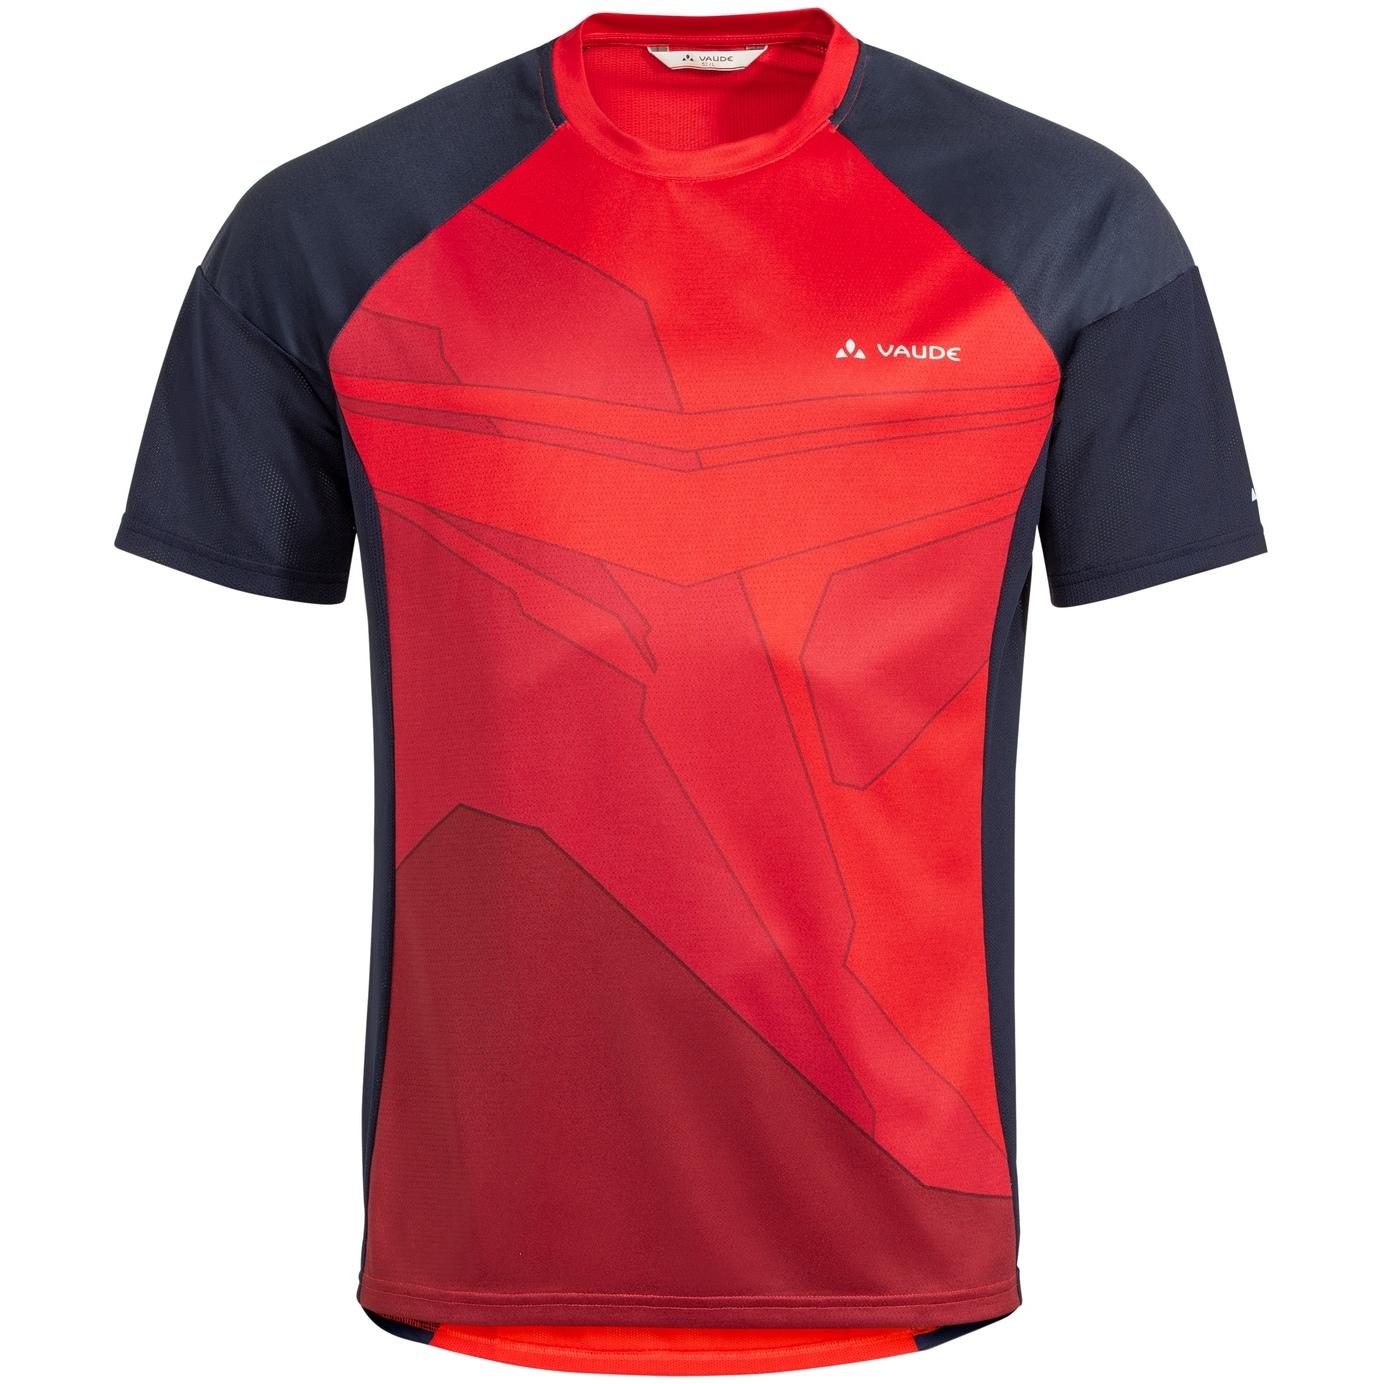 Vaude Moab T-Shirt VI - mars red